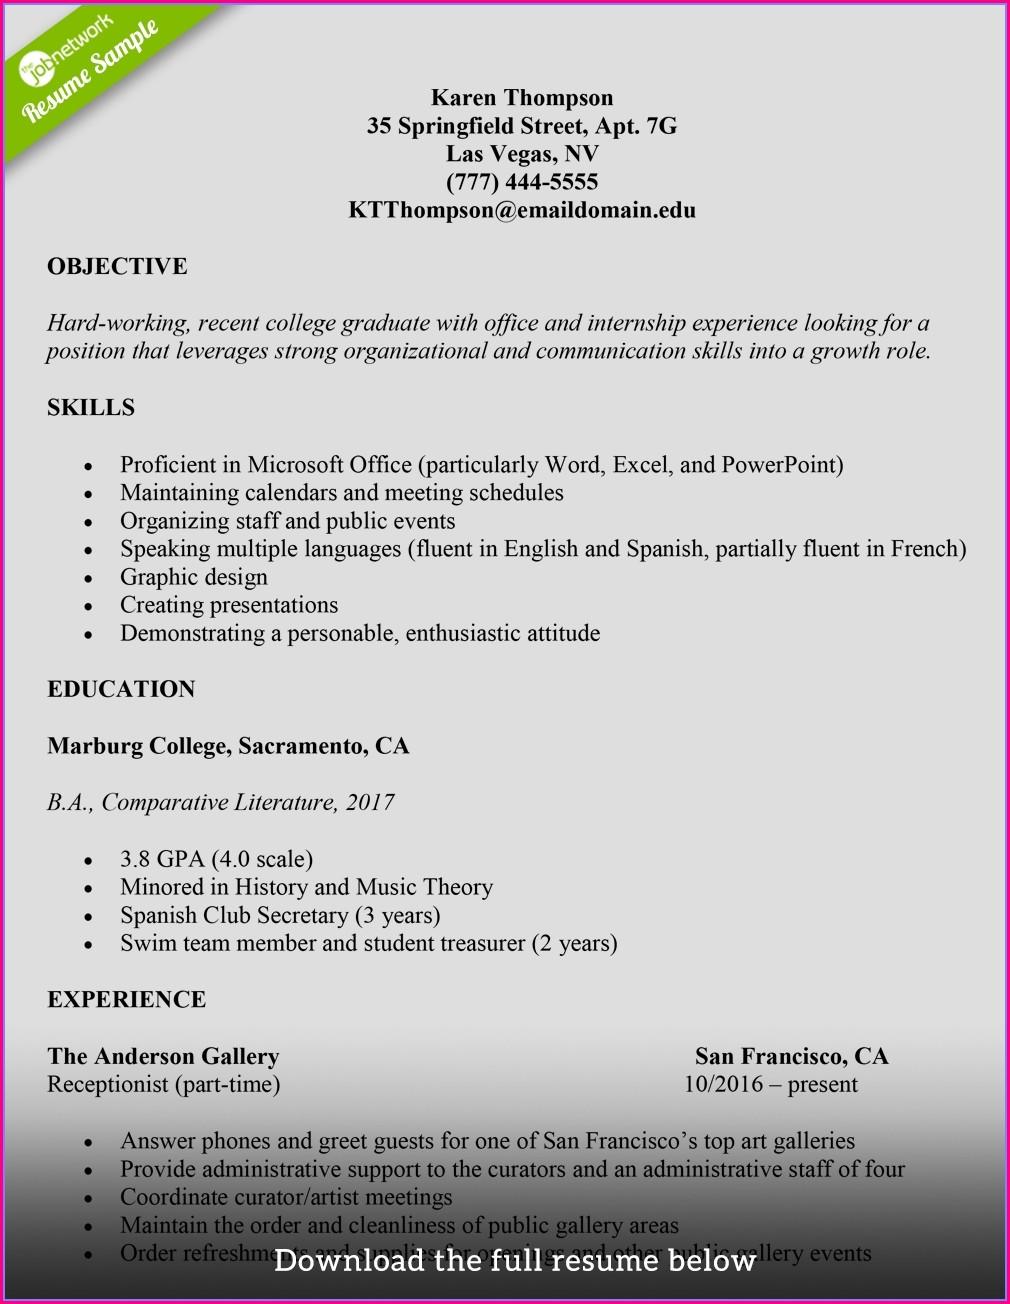 Best Resume Templates For College Graduates